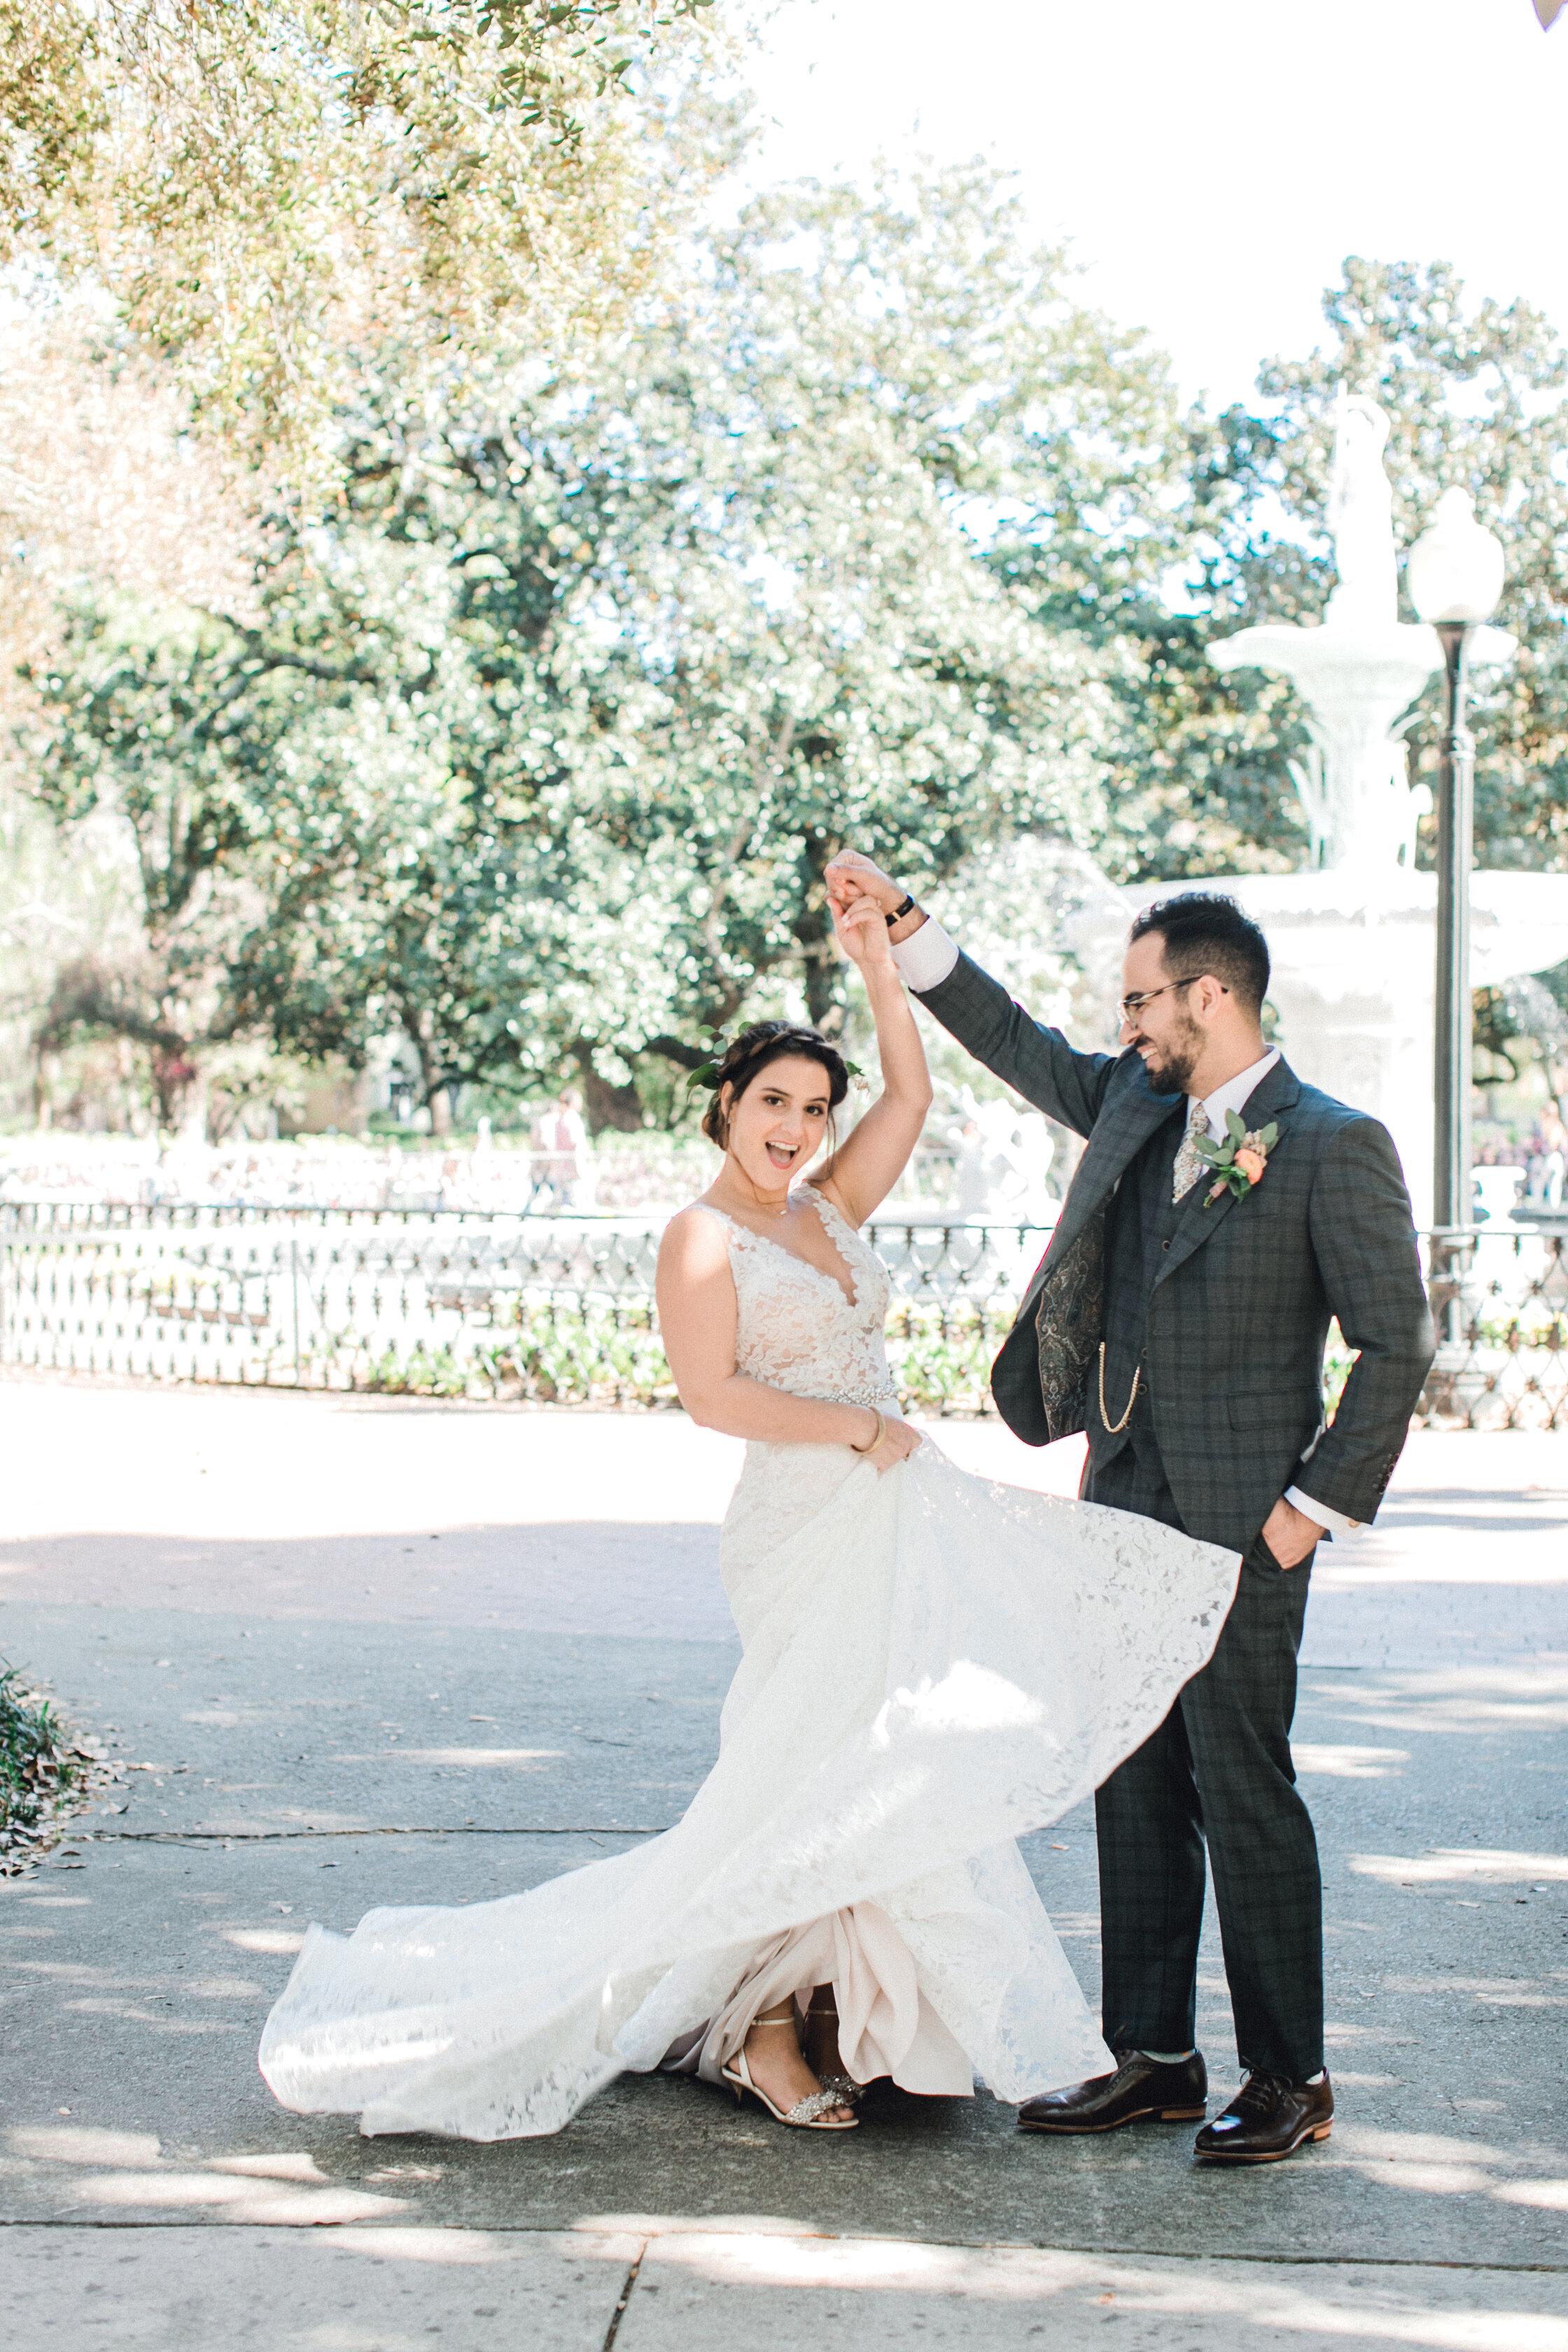 ivory-and-beau-blog-weddings-ivory-and-beau-couple-dominique-and-andres-savannah-florist-wedding-planning-savannah-bridal-boutique-wedding-flowers-KIP_WEBERWEDDING_RAILROADMUSEUM-681.JPG